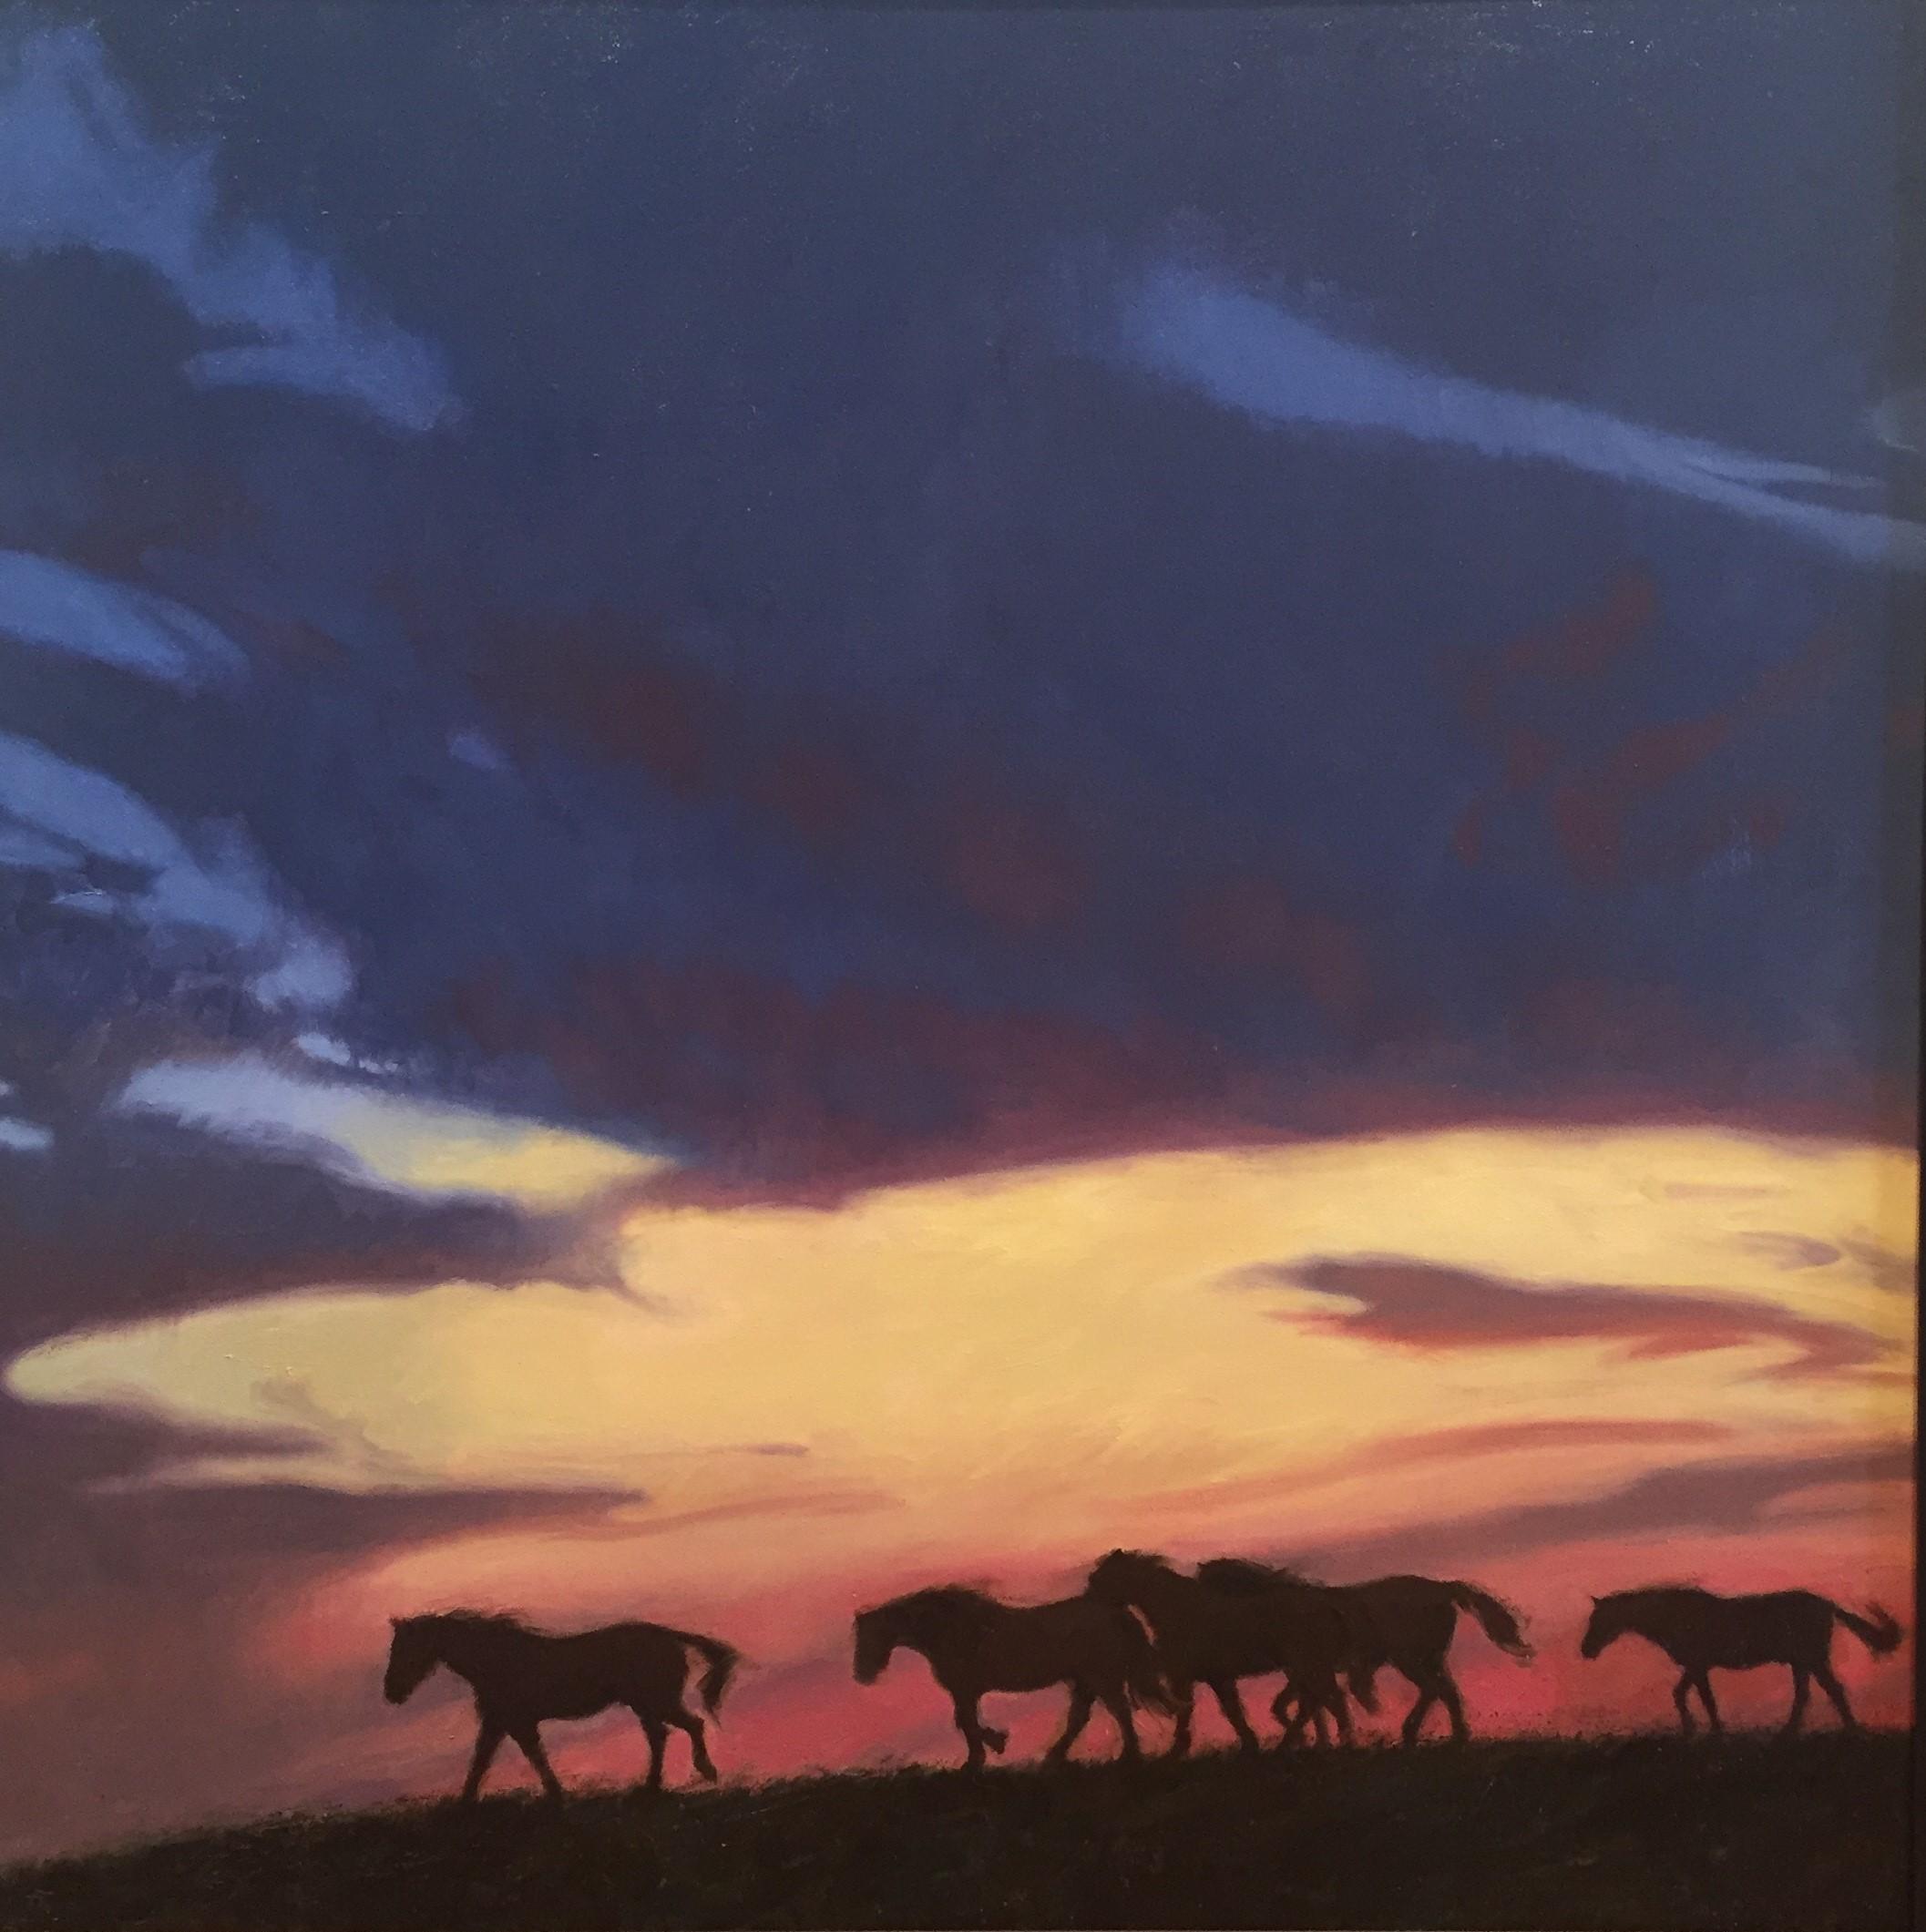 Hoofbeats at Twilight